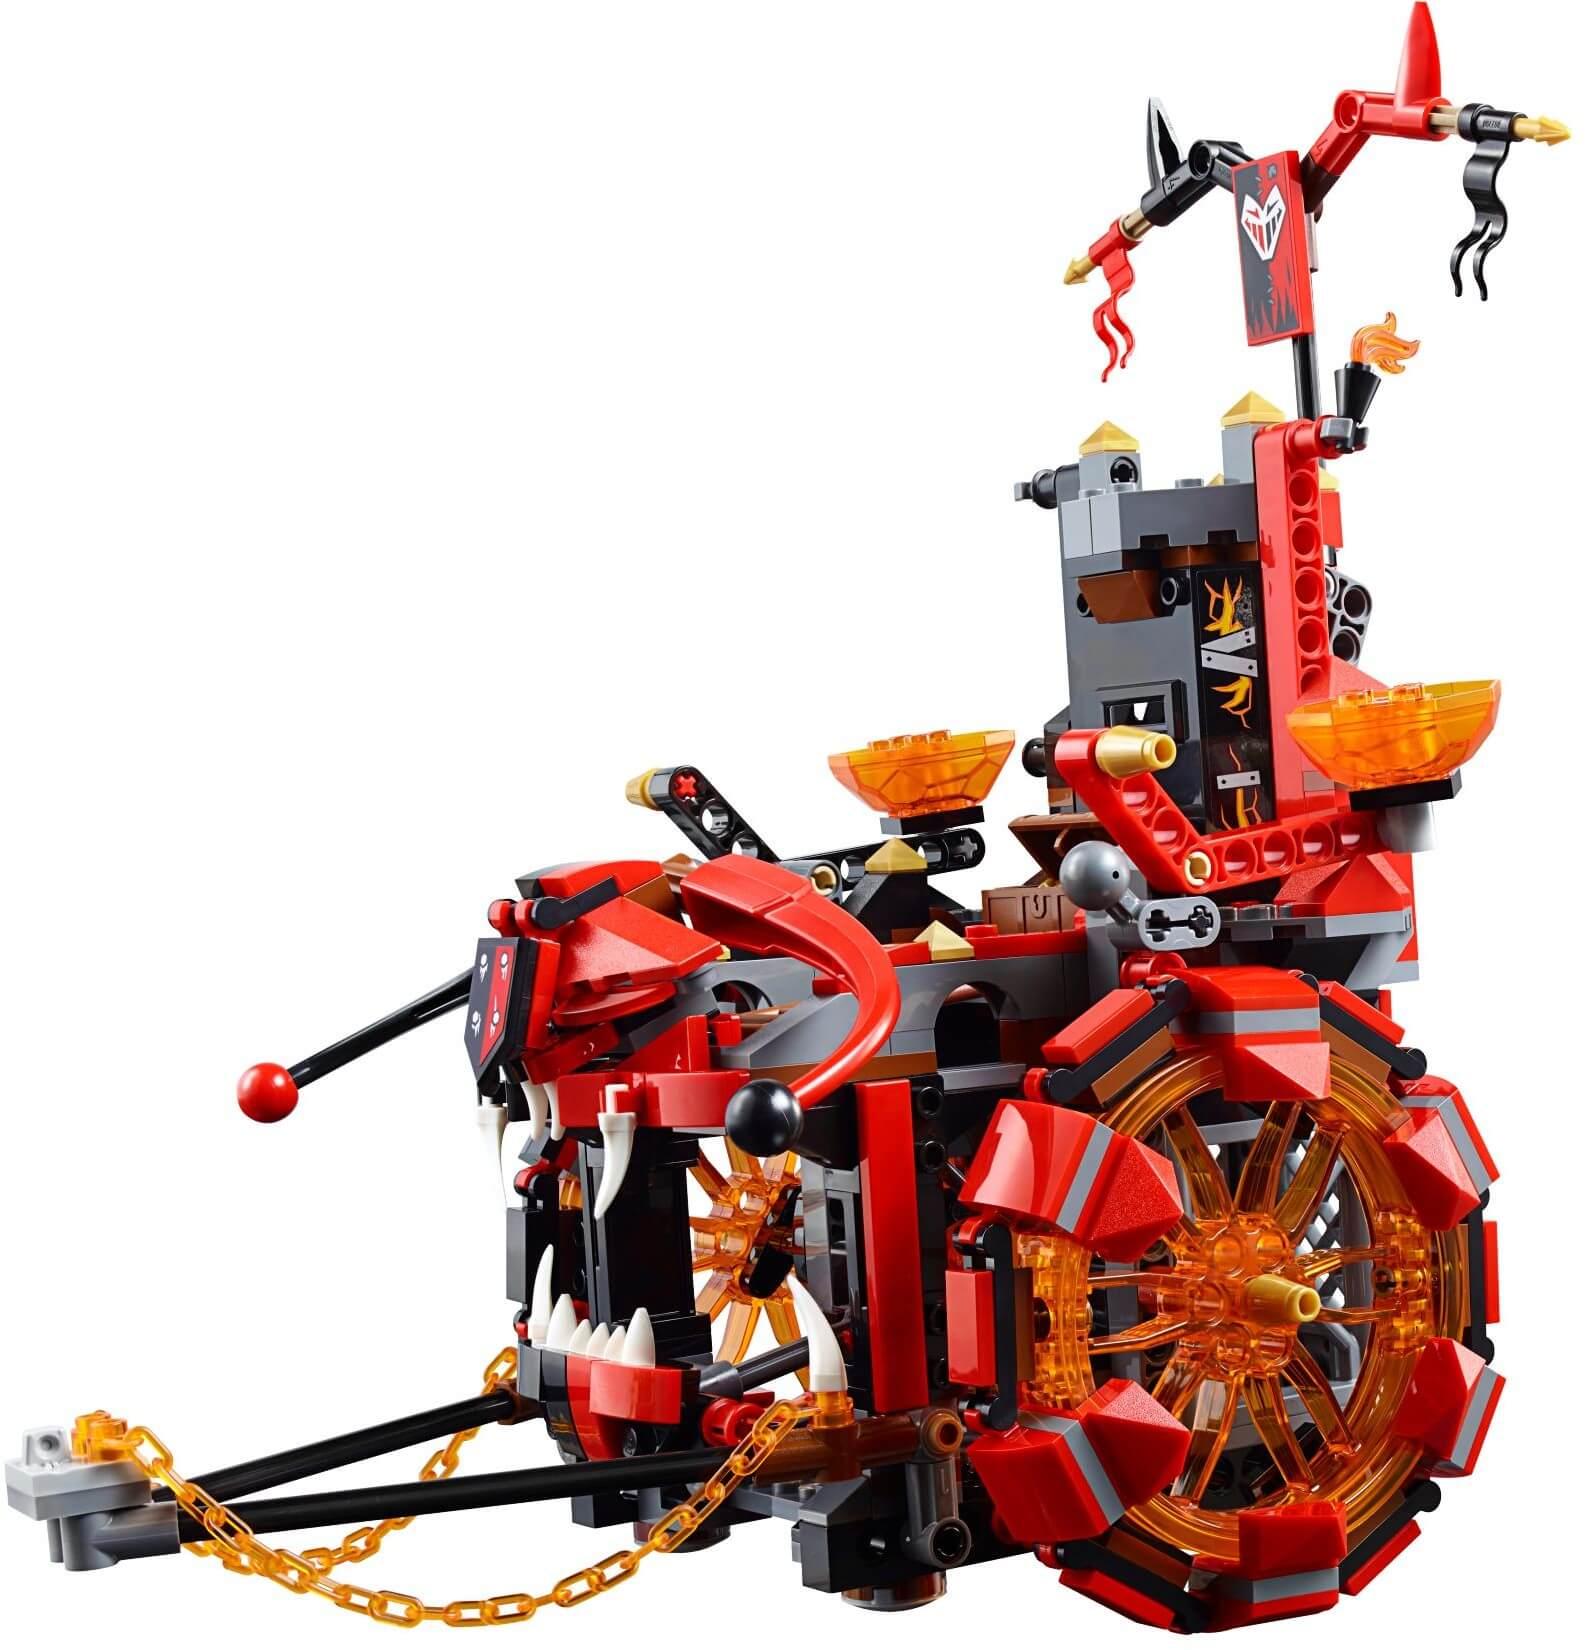 Mua đồ chơi LEGO 70316 - LEGO Nexo Knights 70316 - Cỗ xe quỷ dữ của Jestro (LEGO Nexo Knights Jestro's Evil Mobile 70316)